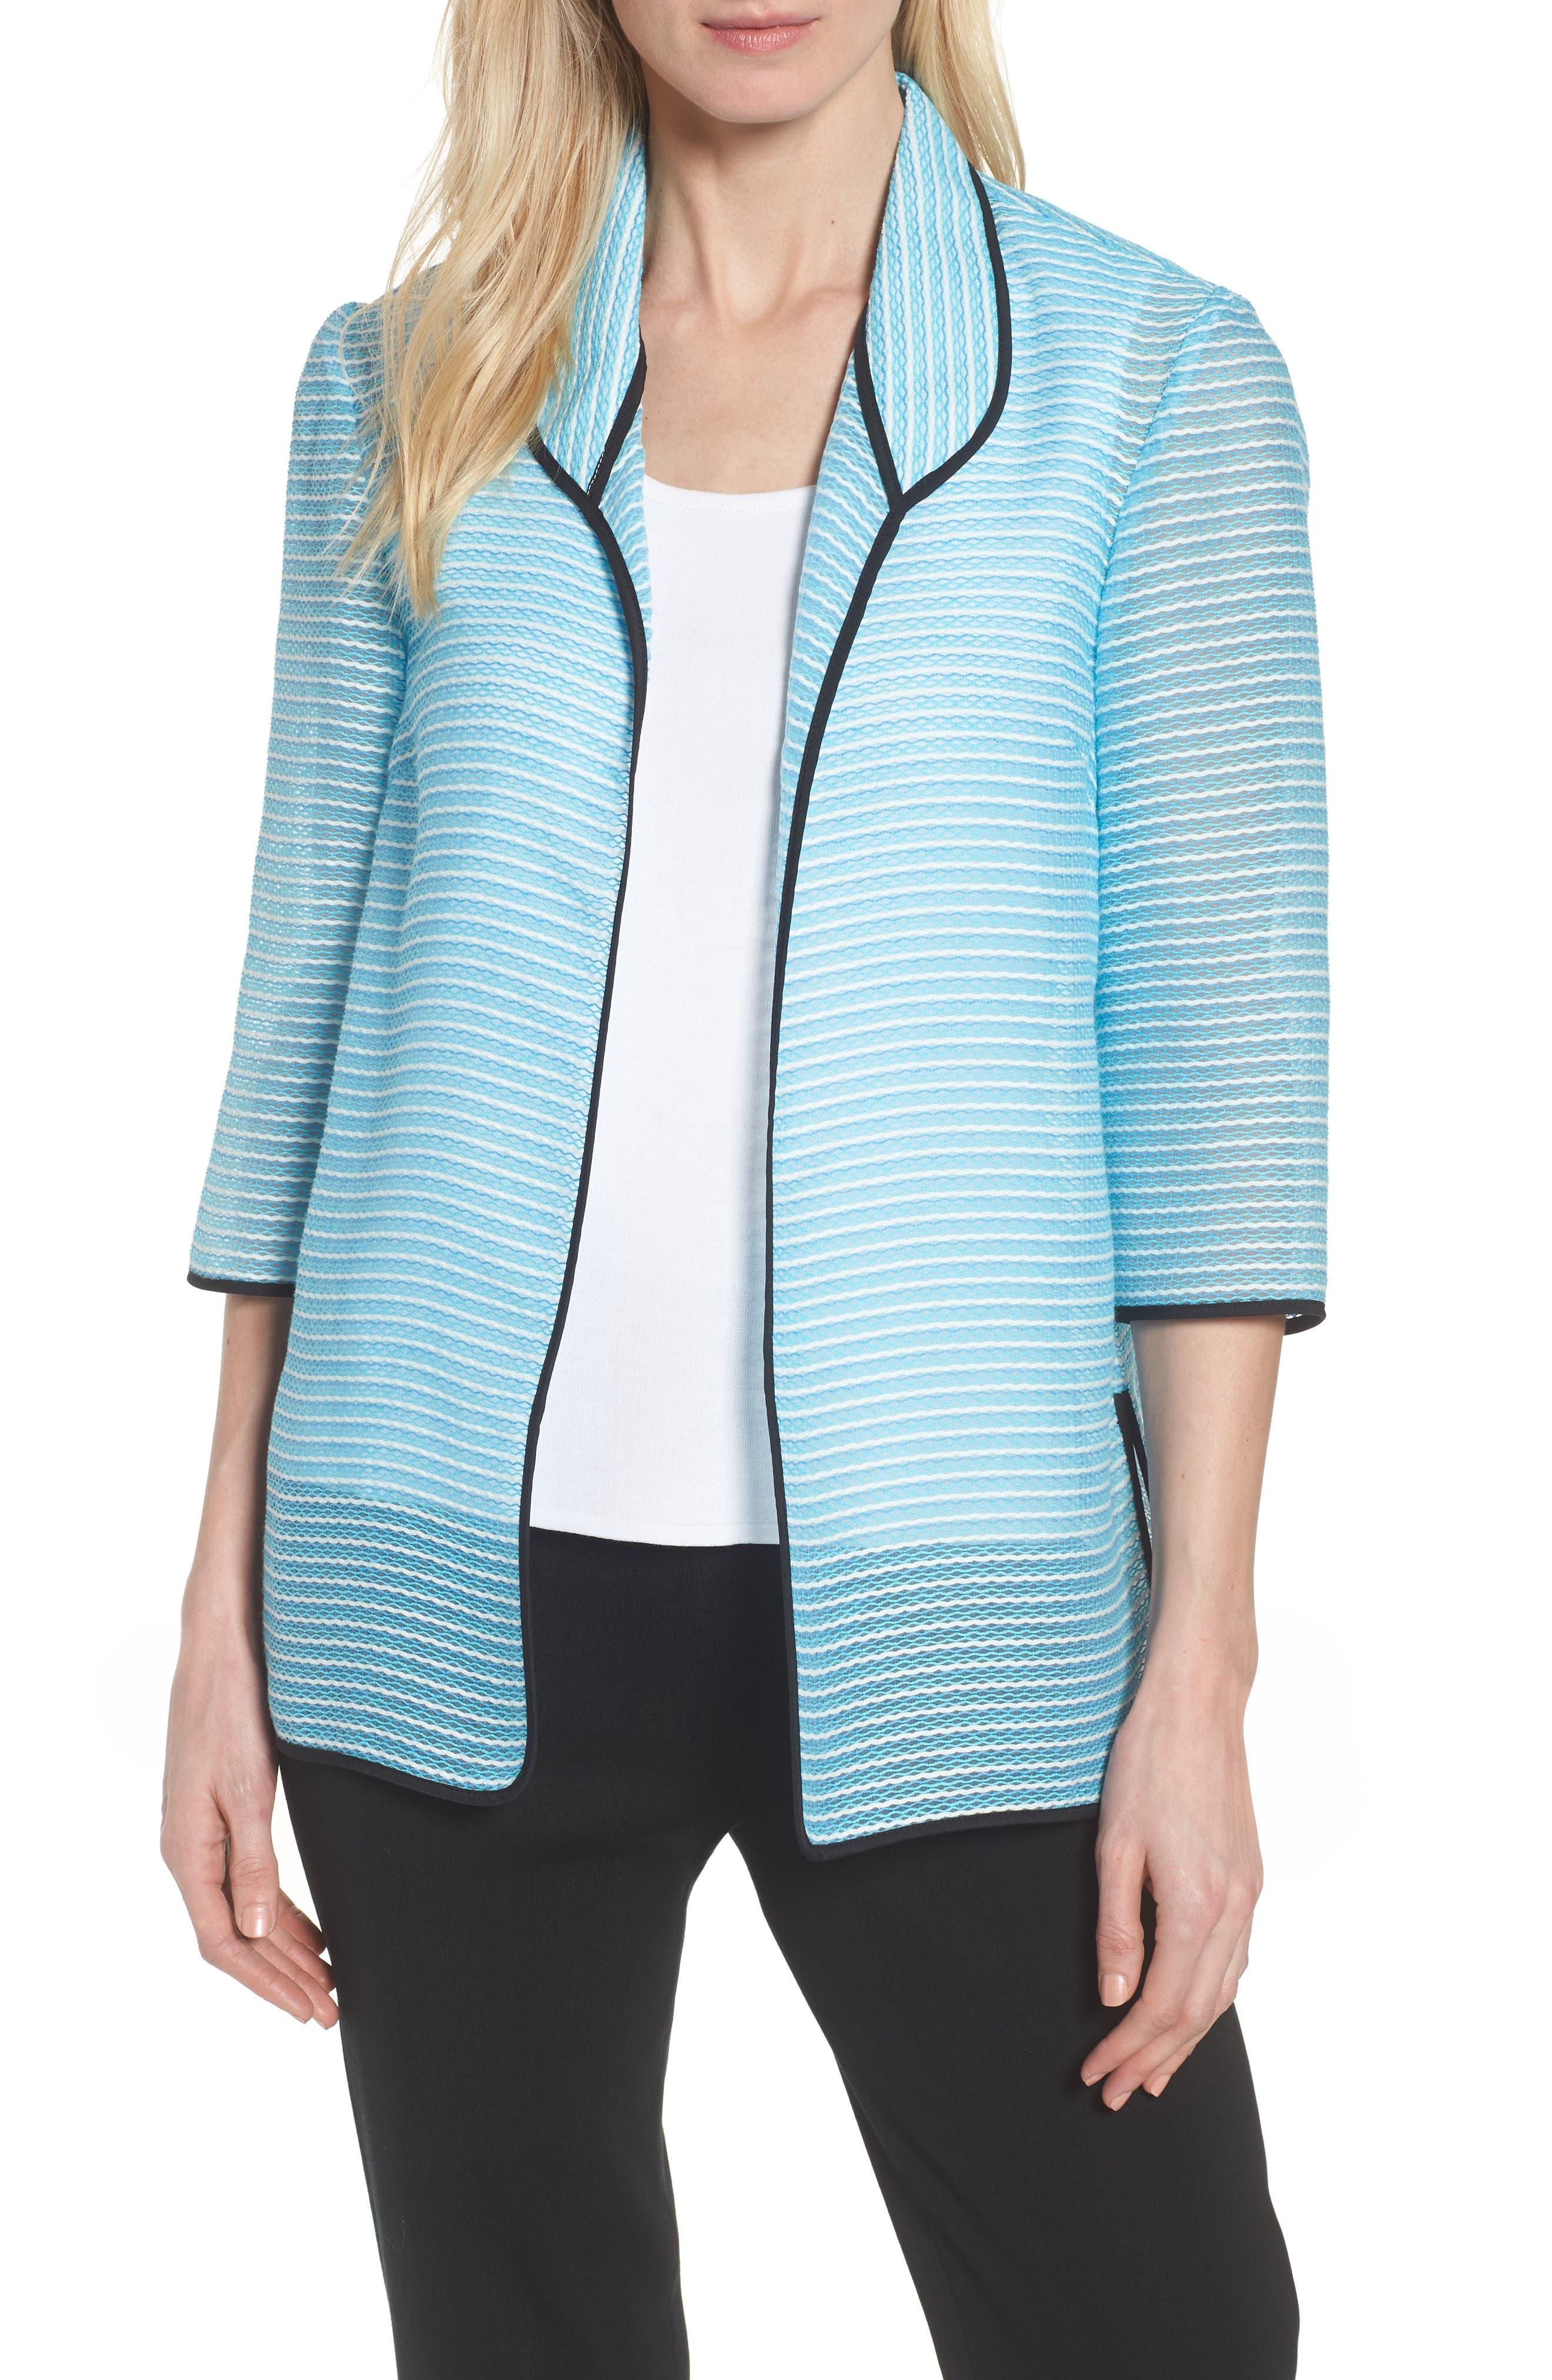 Ming Wang Textured Knit Three Quarter Sleeve Jacket